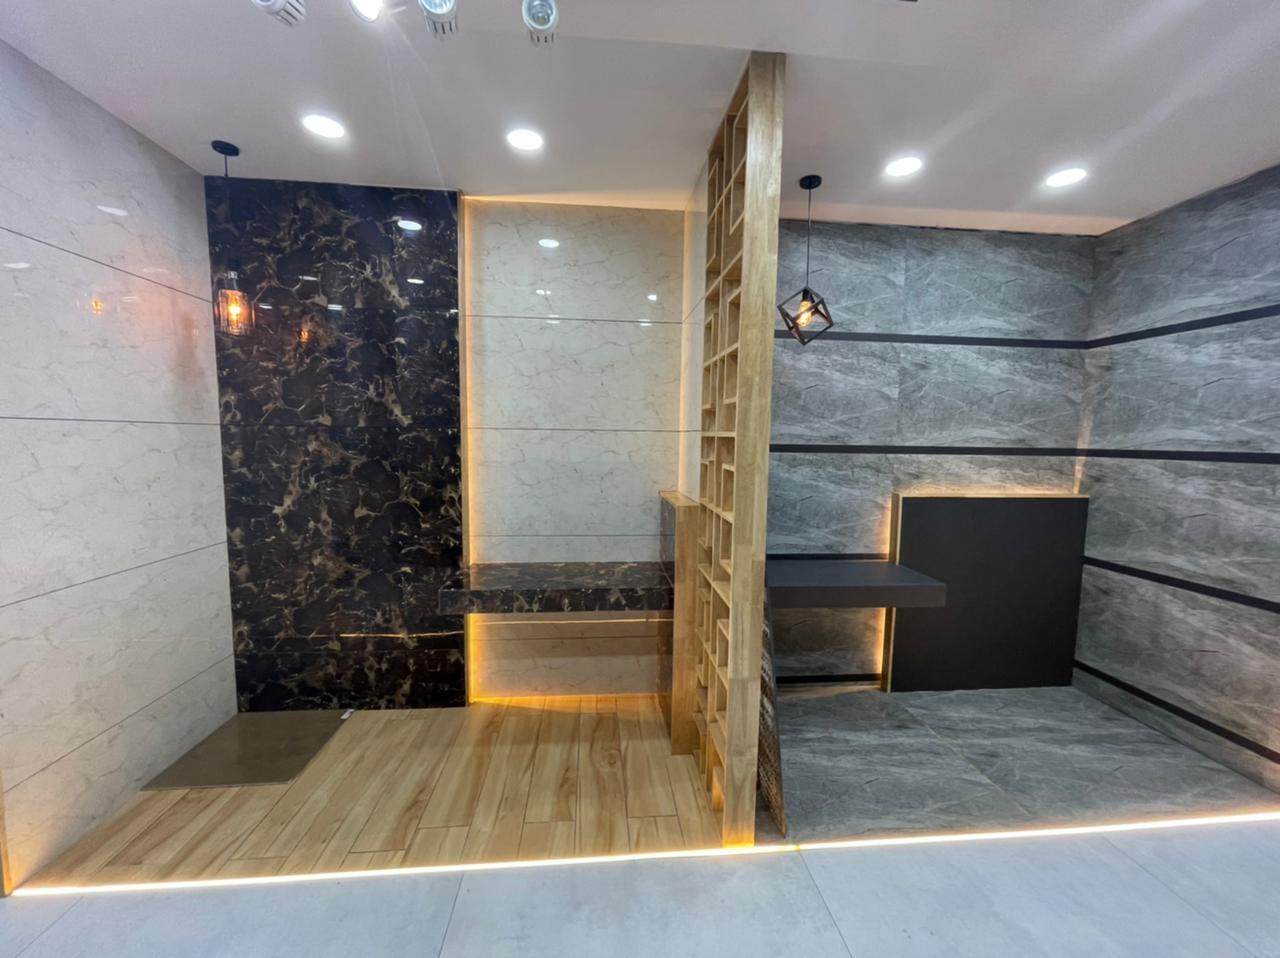 Cerajot Bathtoom Mockup Design image with Gray and Black Tiles